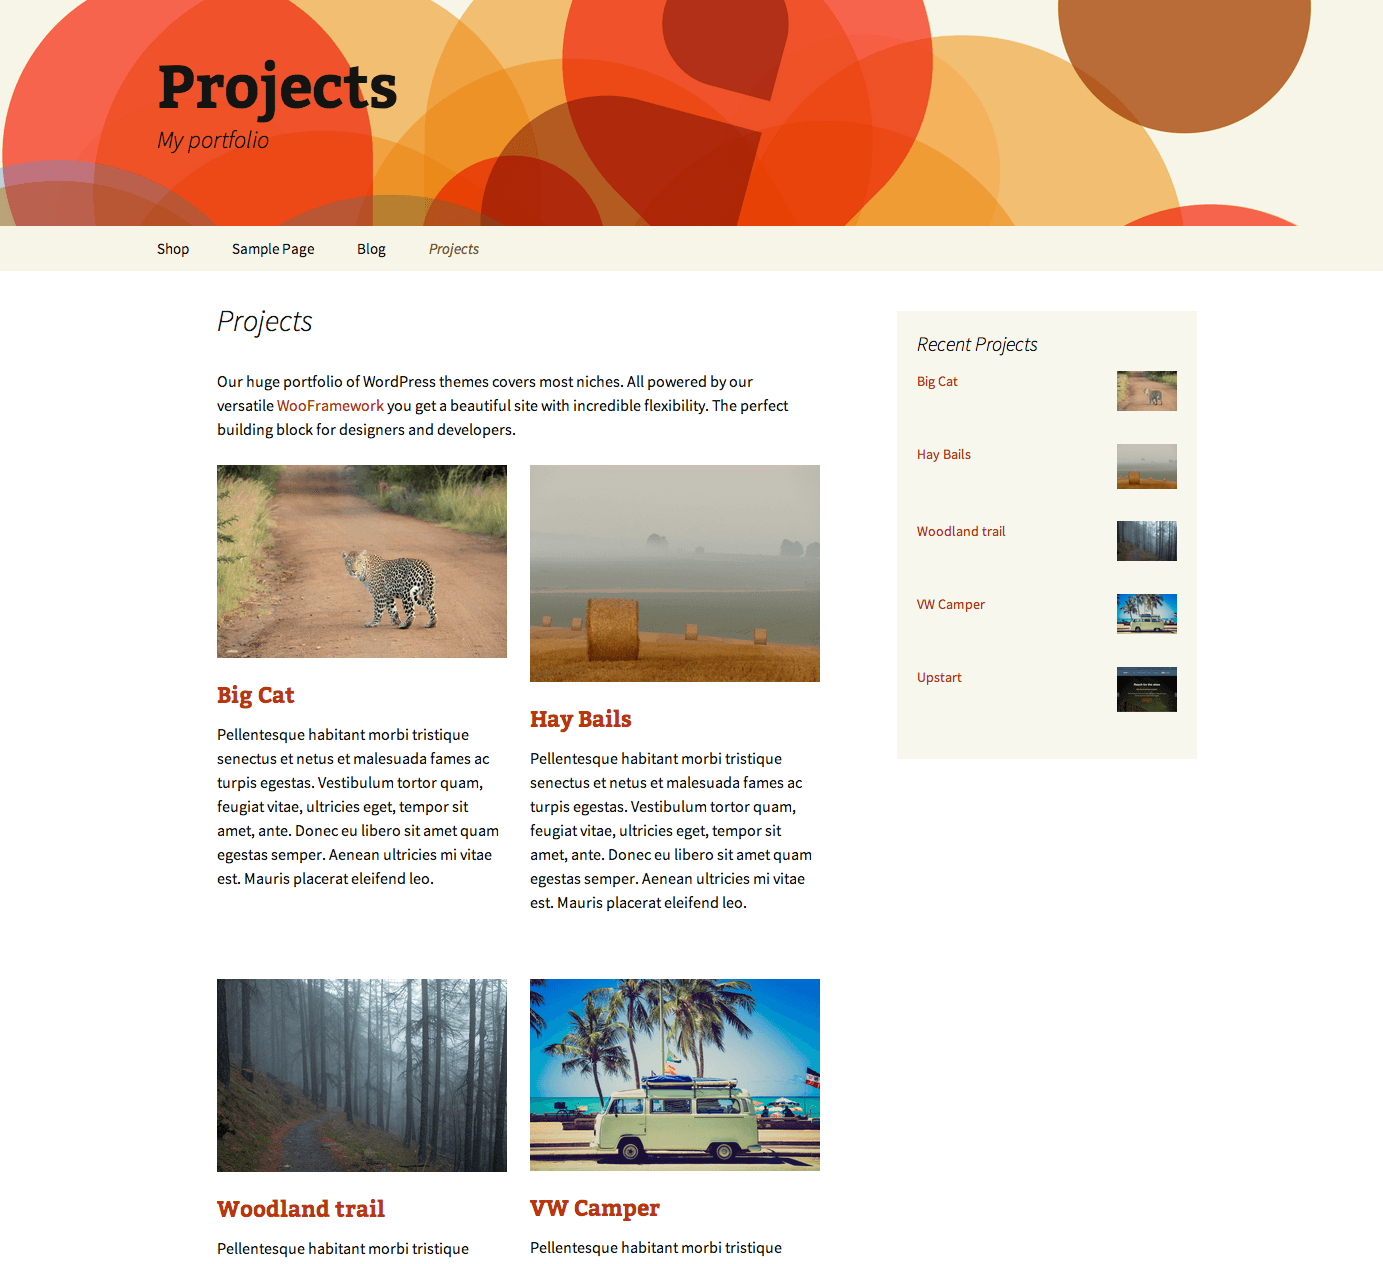 image of Wootheme portfolio plugin